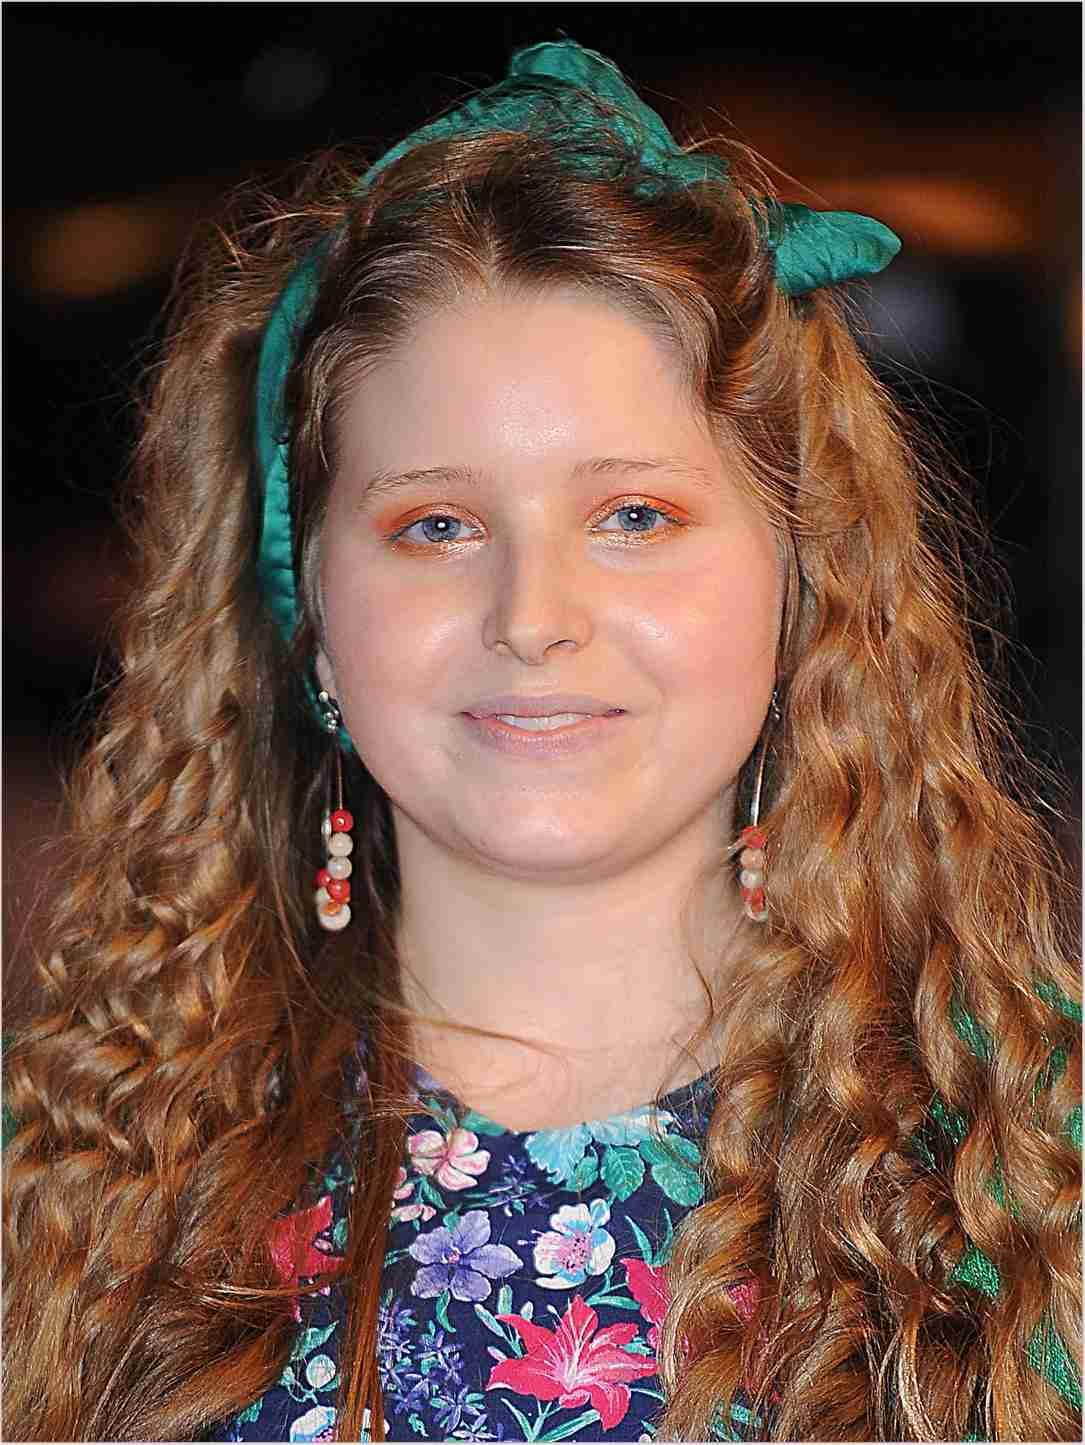 Jessie Cave Net Worth, Bio, Height, Family, Age, Weight, Wiki